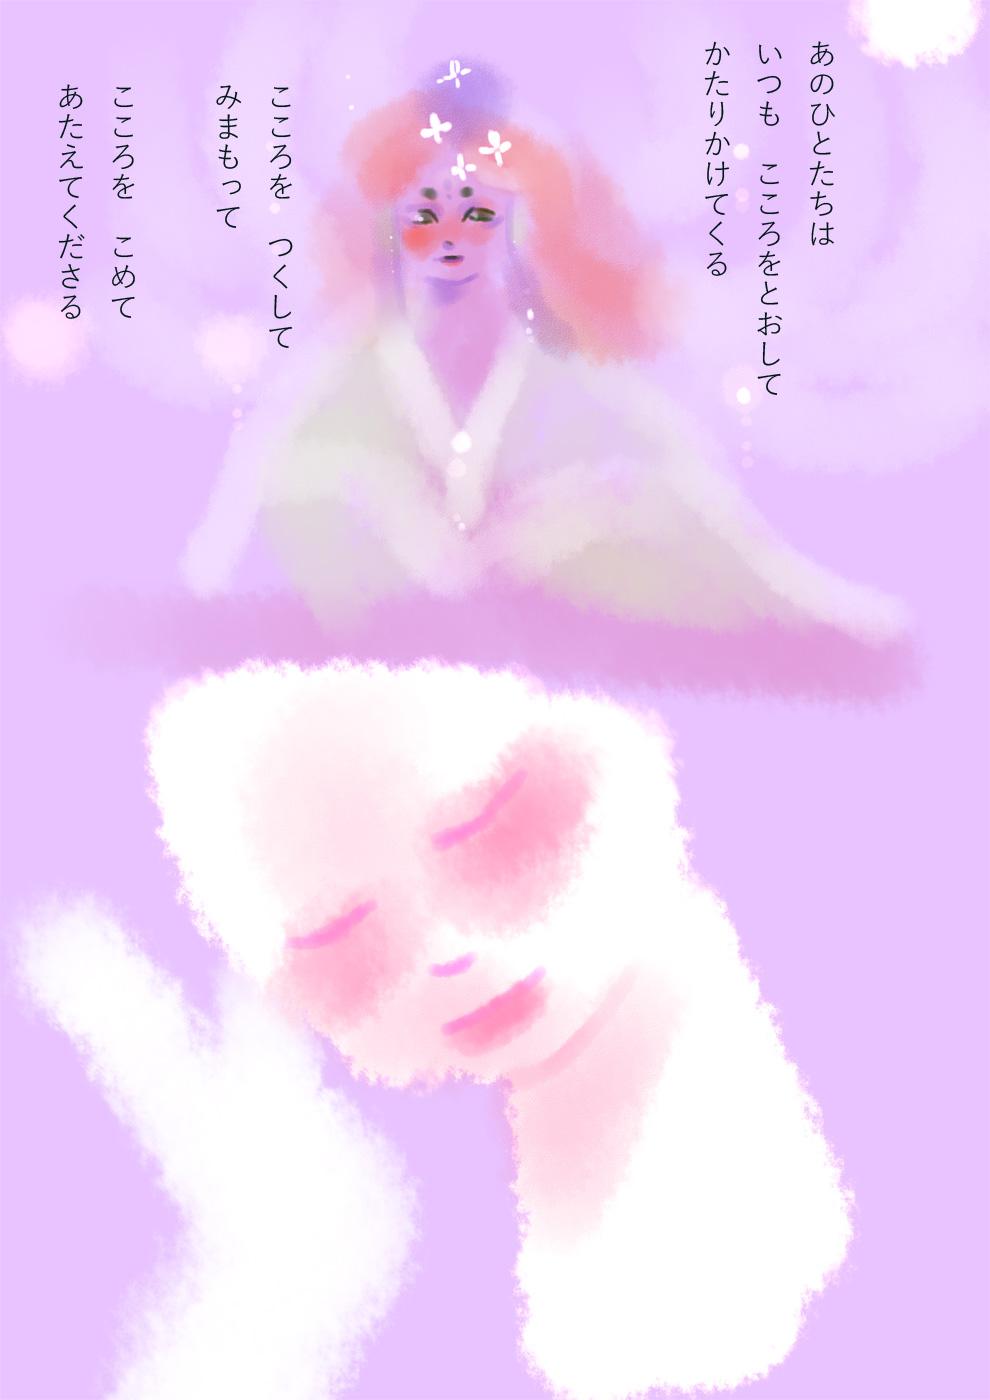 http://ahito.com/comic/ehon/kamiuta/img/2018/20180322/03.jpg